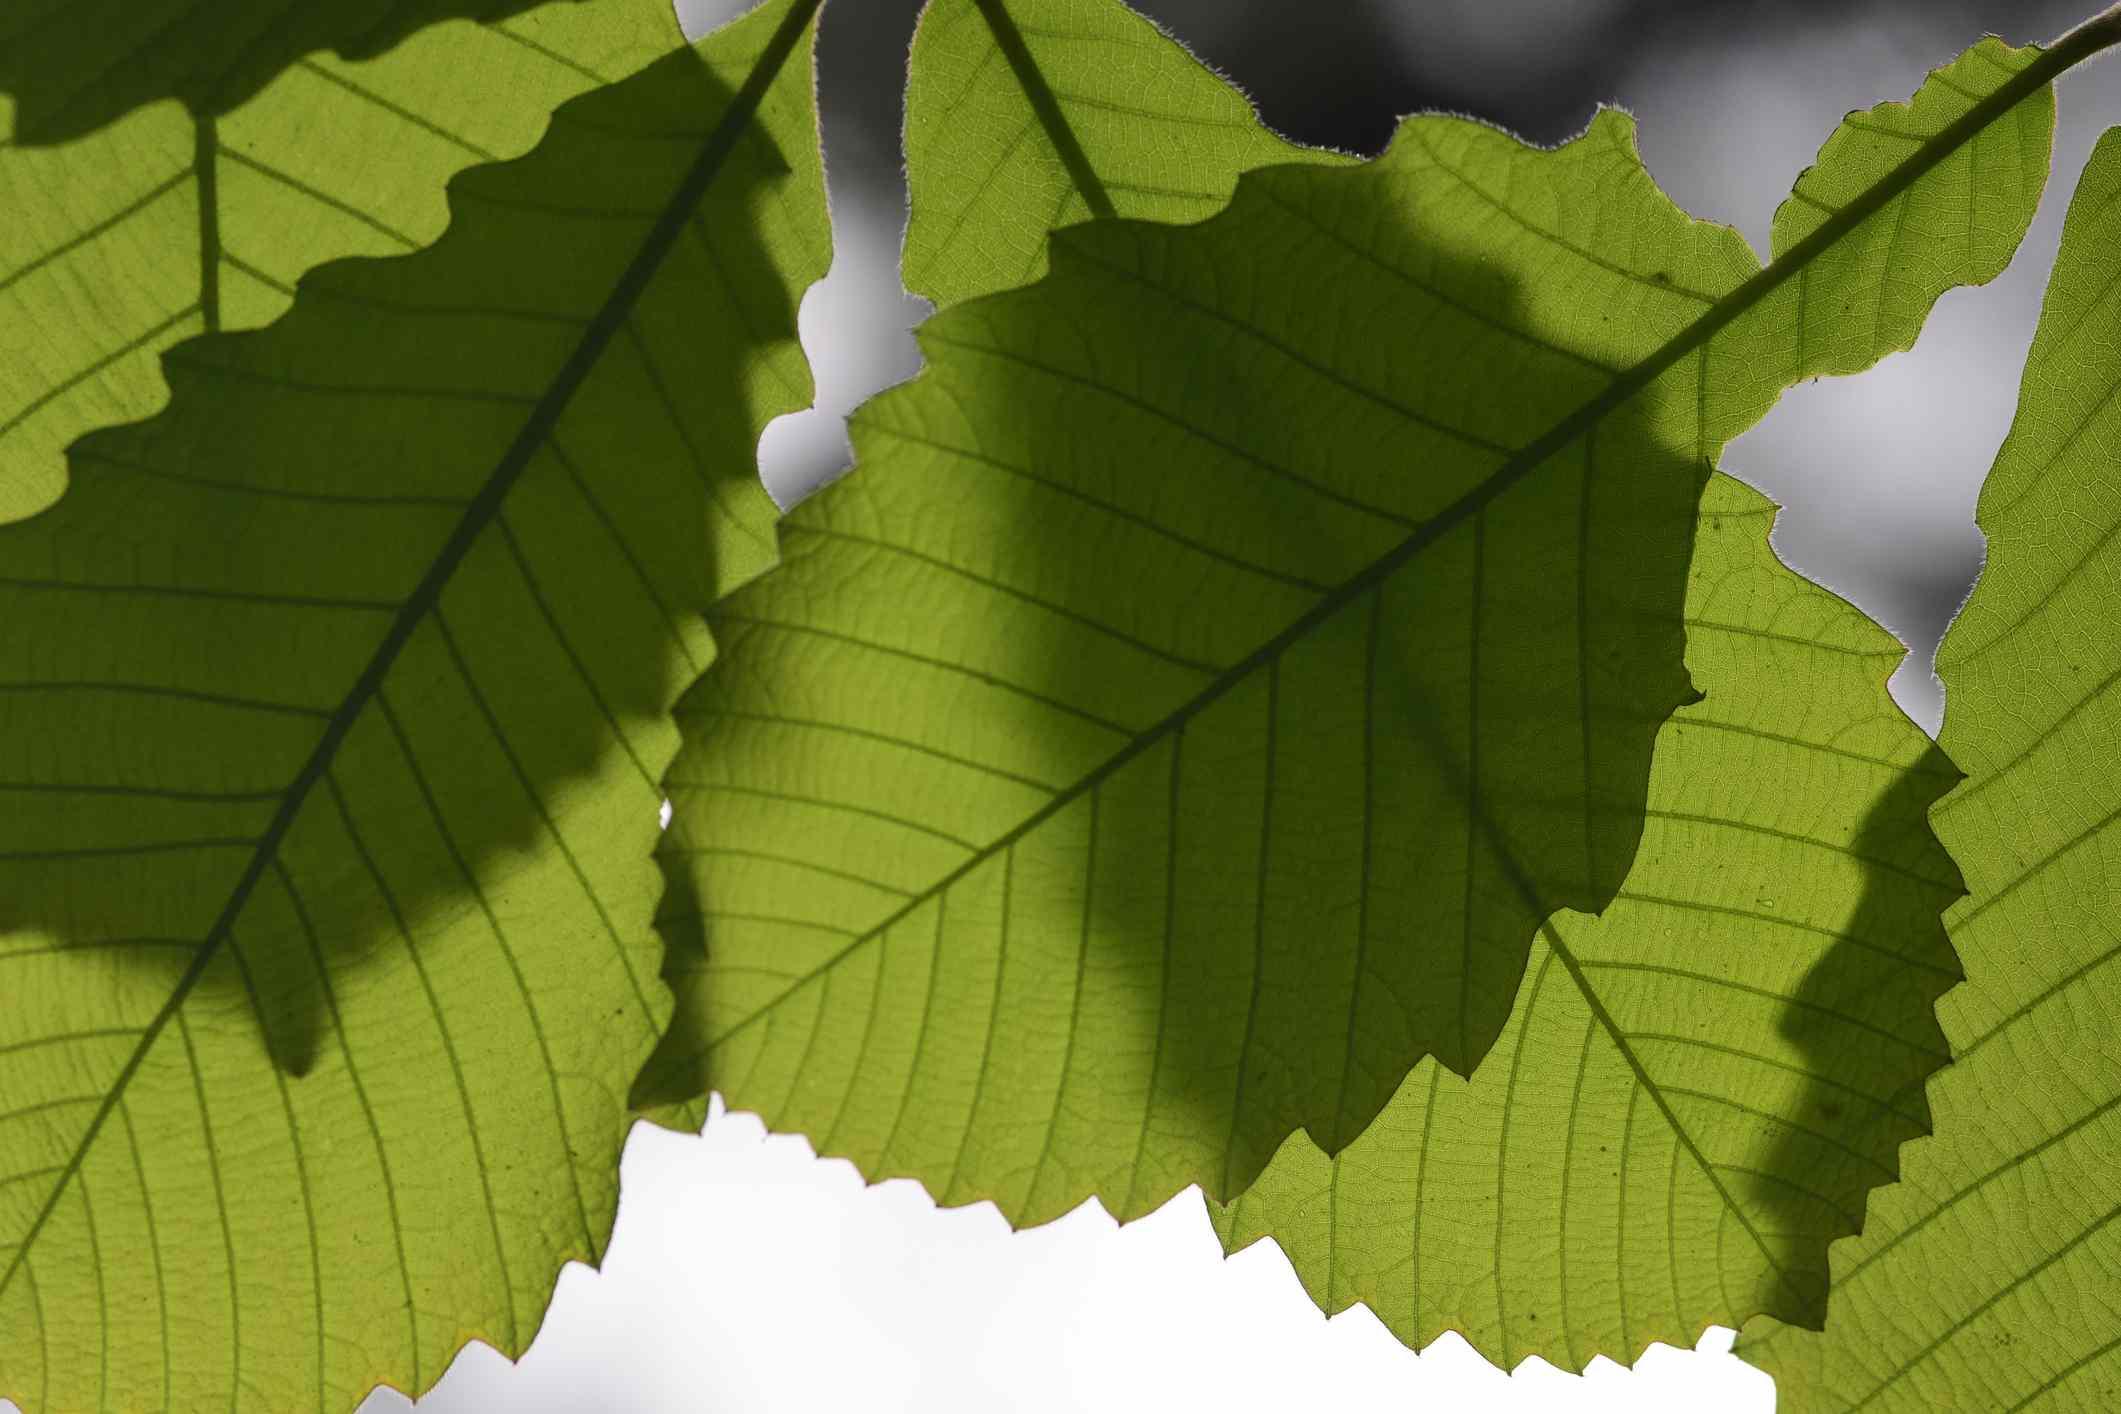 Macro of toothy oak leaves casting shadows on lower leaves